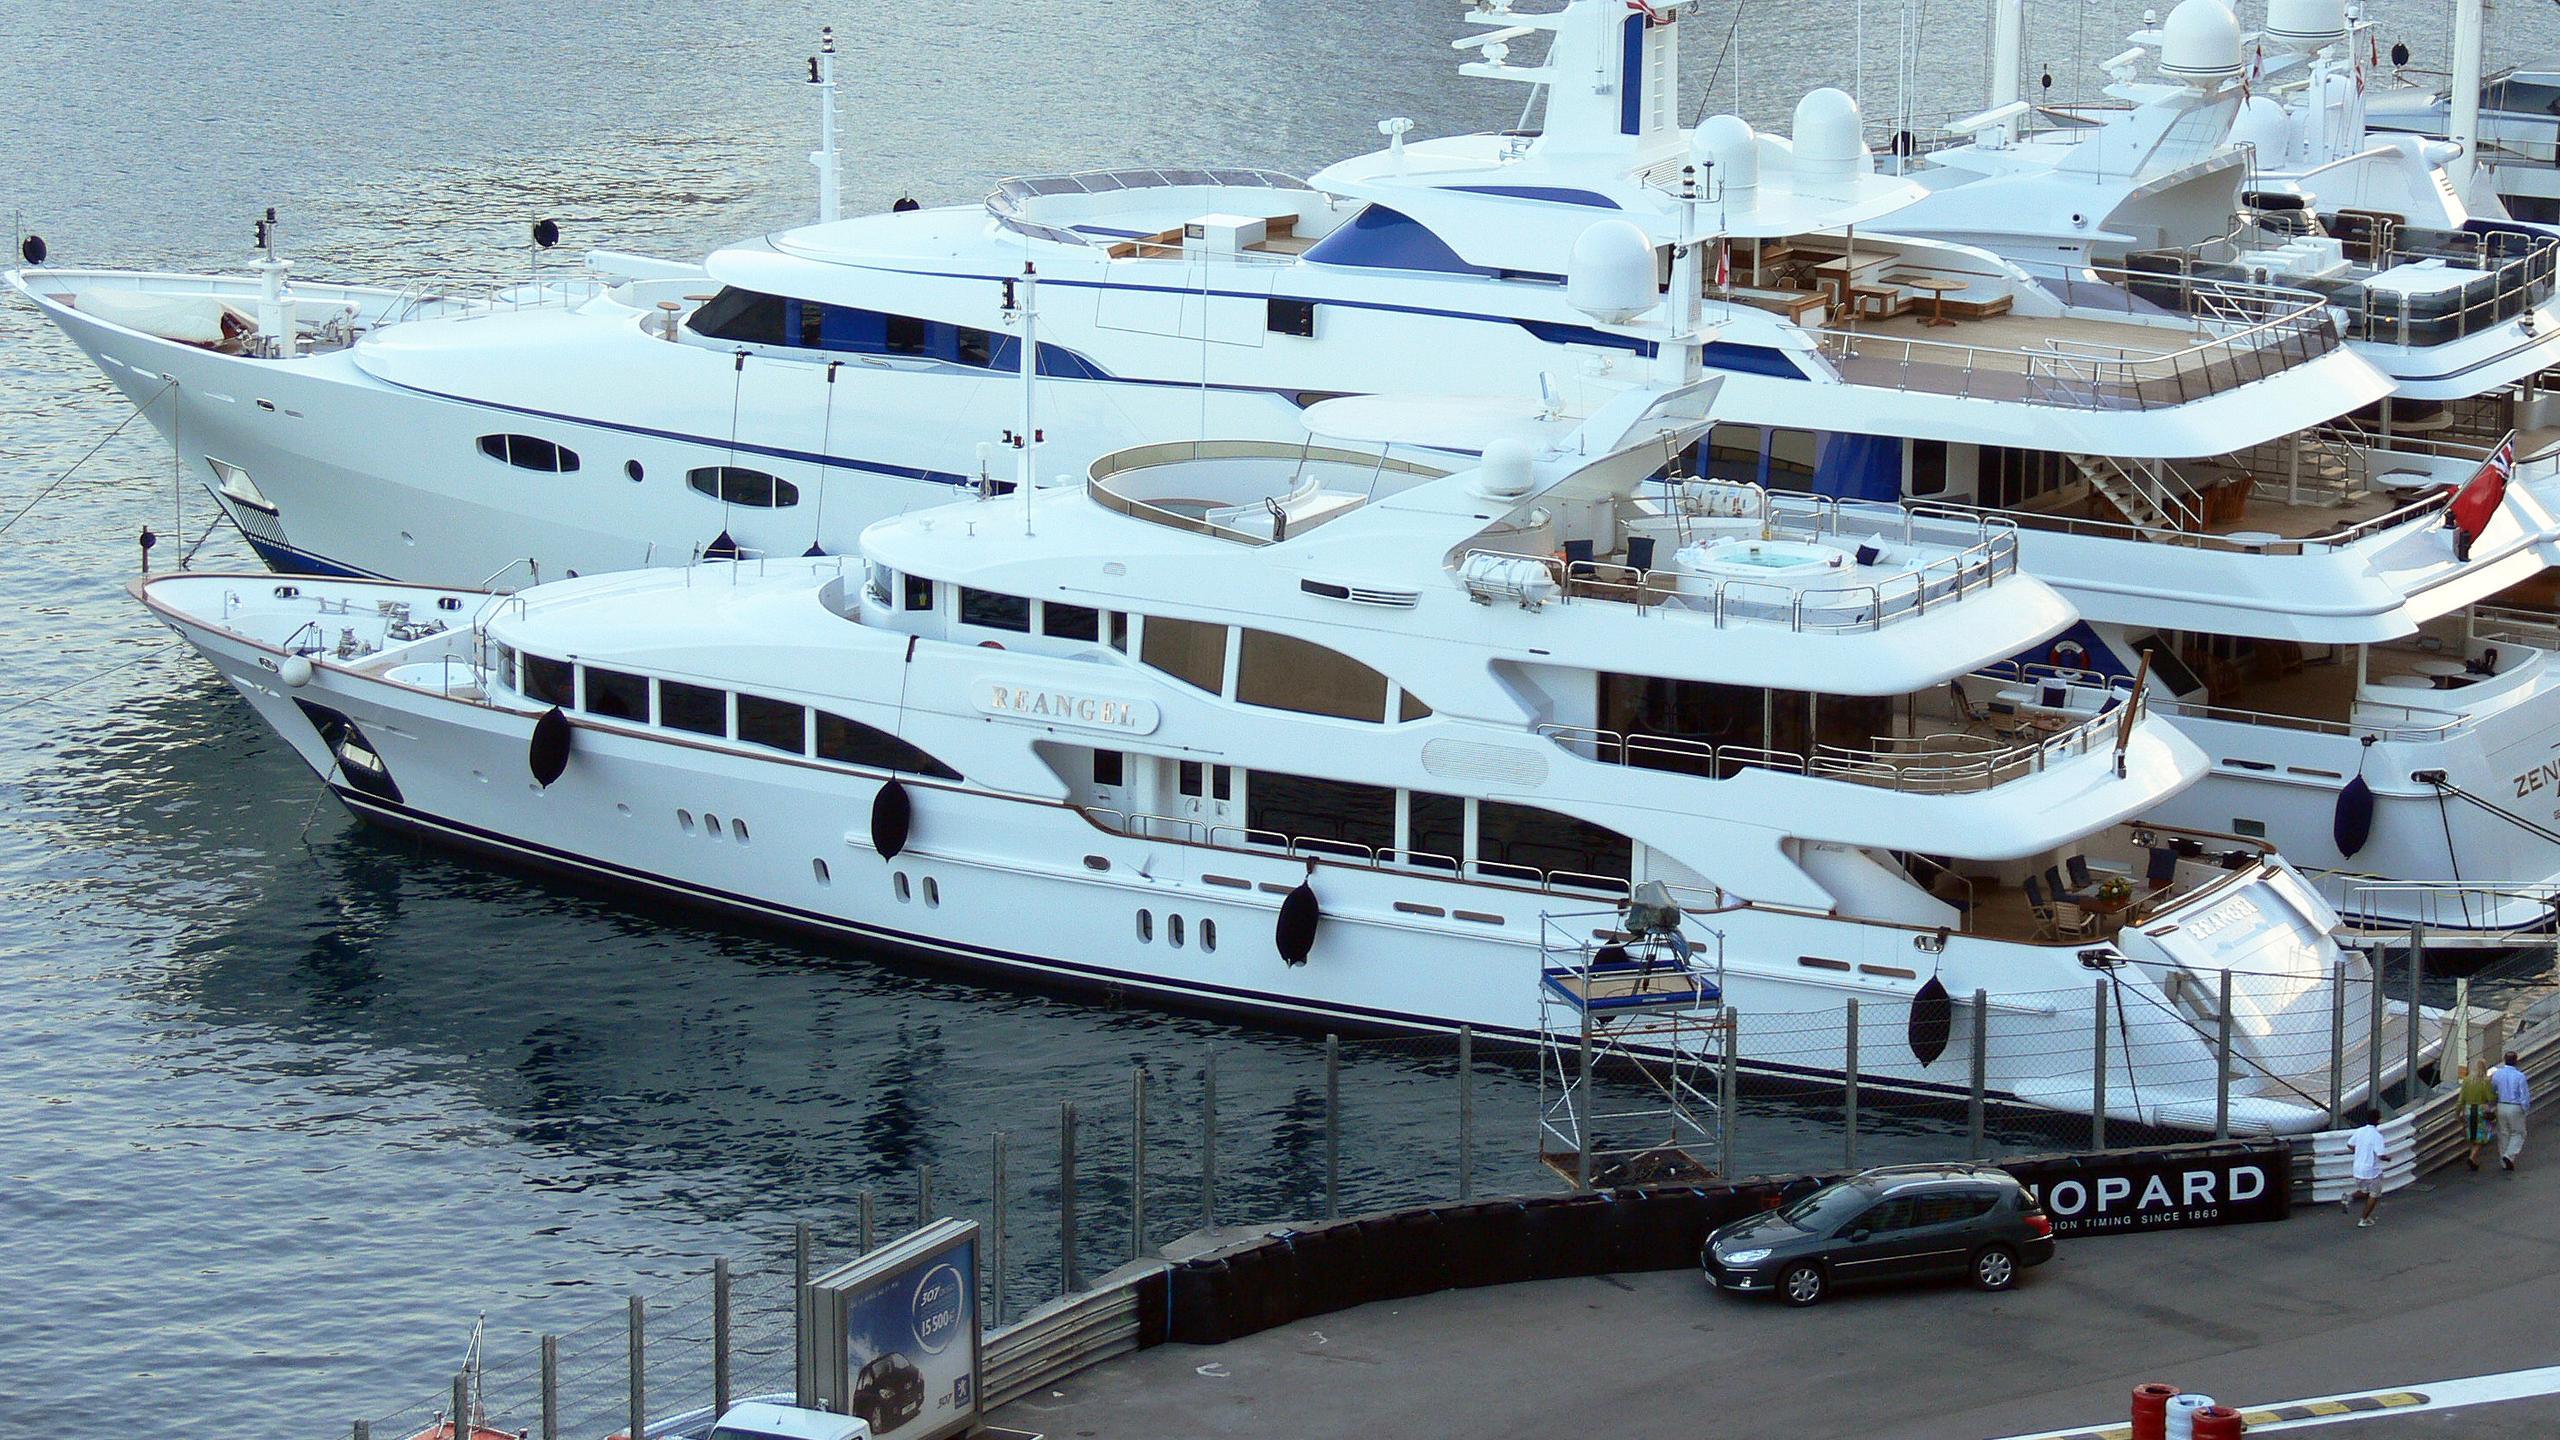 sovereign-3-motor-yacht-benetti-vision-2002-44m-profile